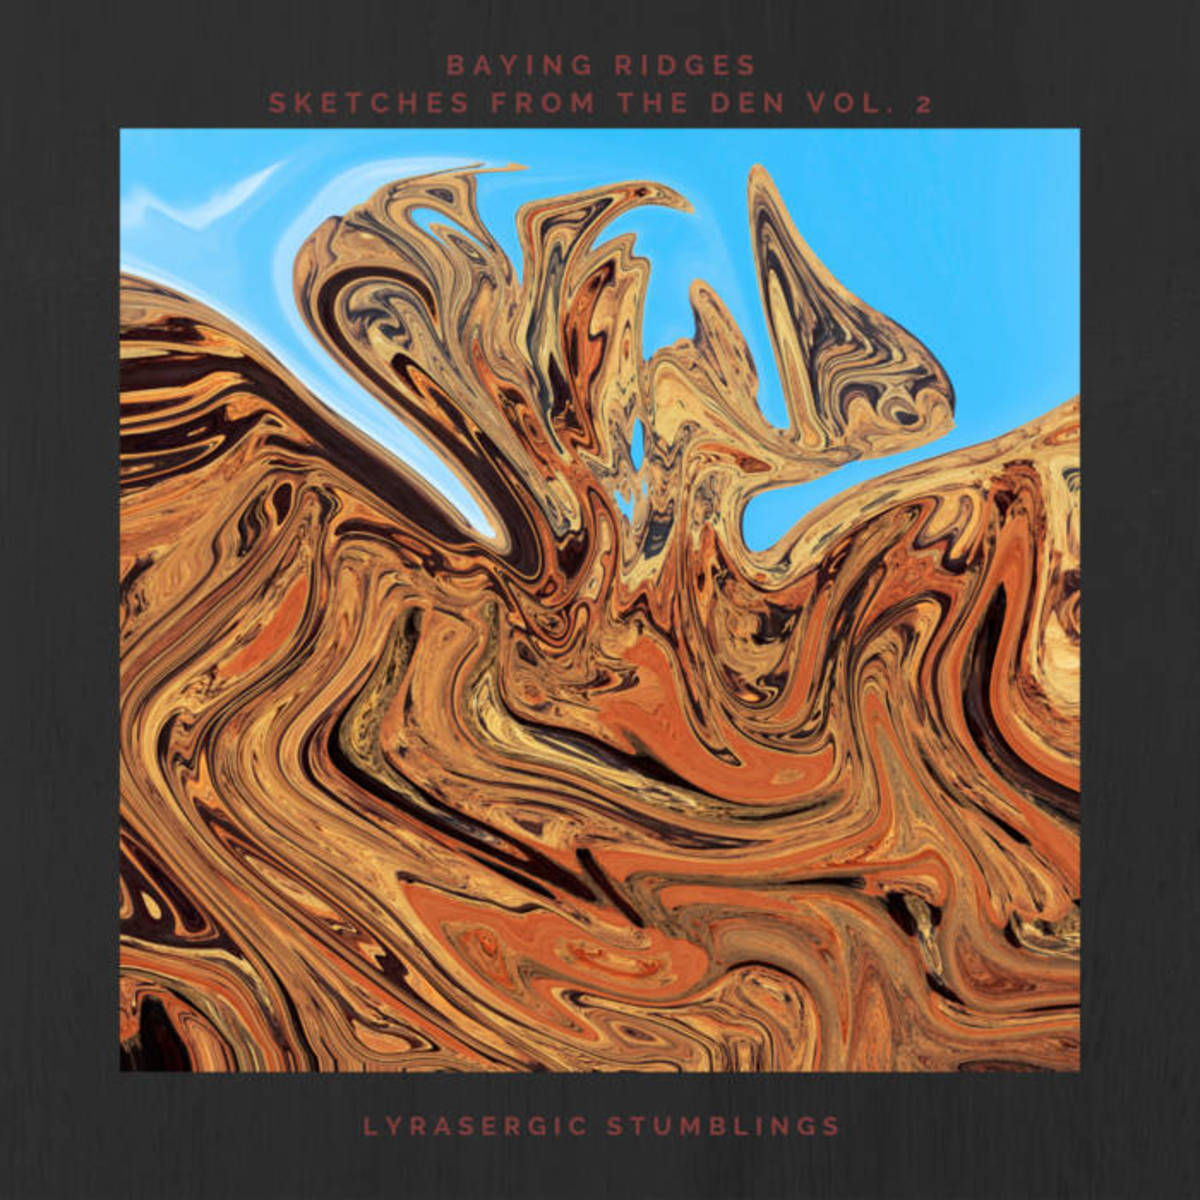 ambient-music-single-lyrasergic-stumblings-by-baying-ridges